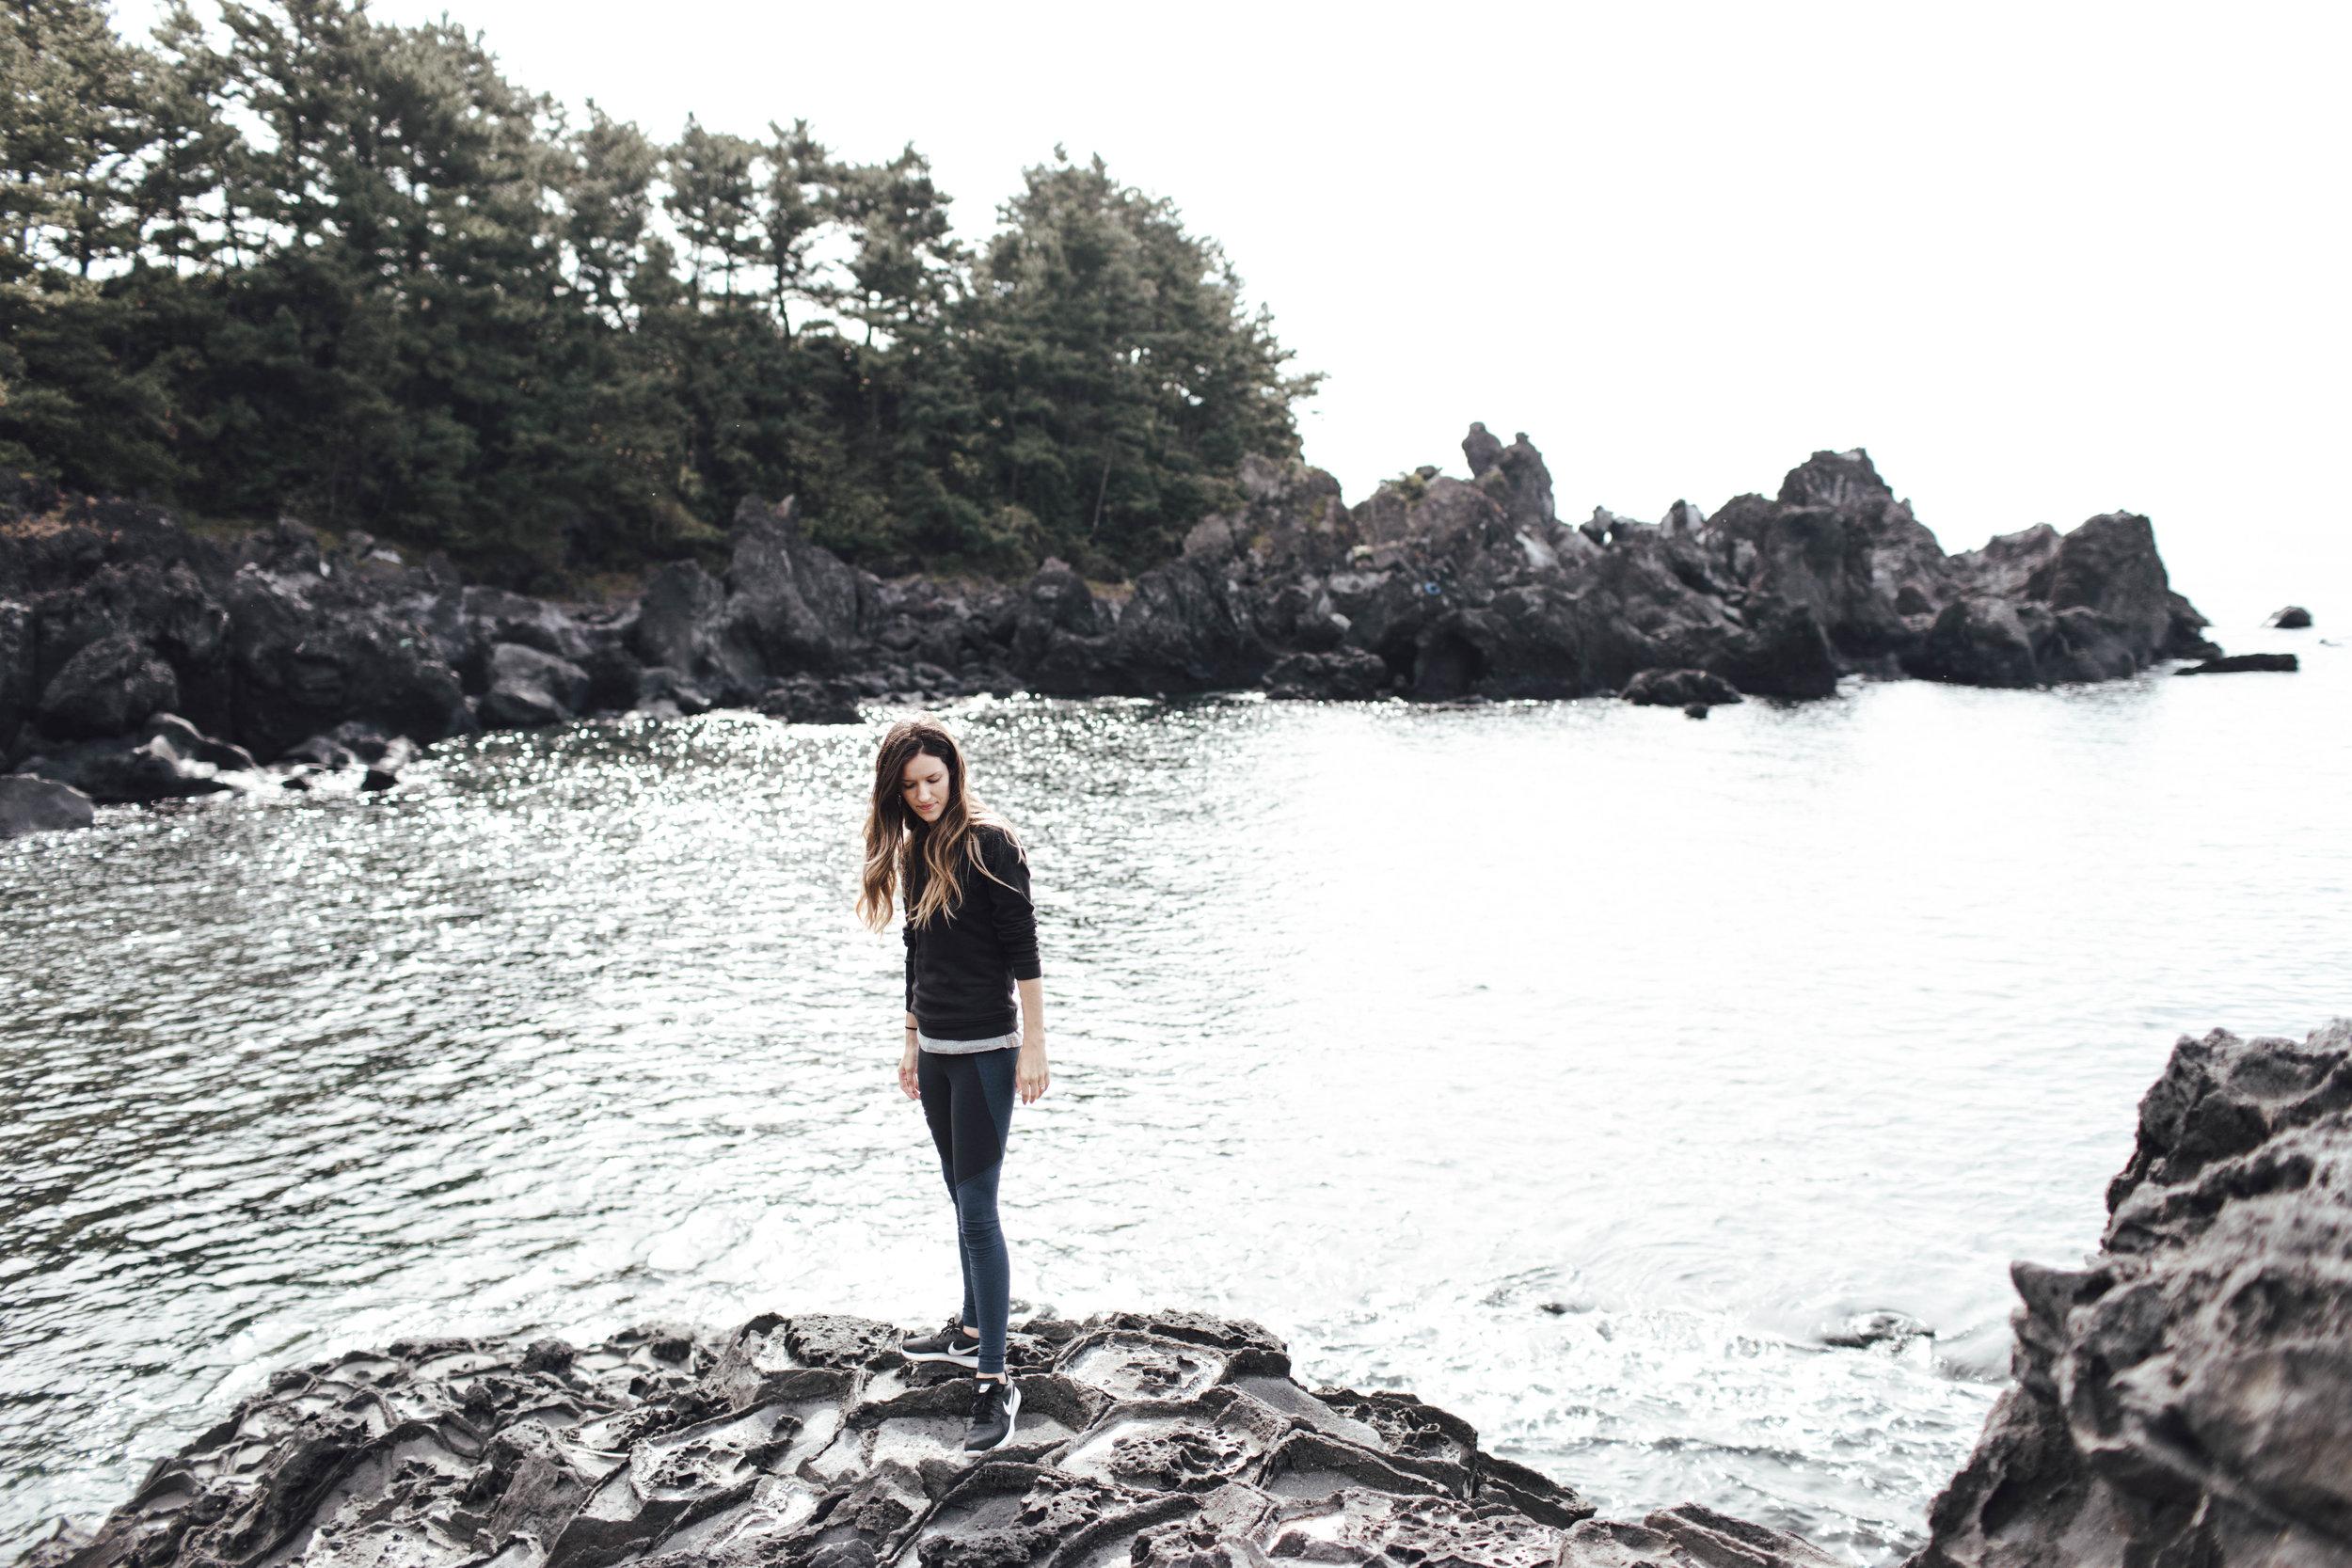 jeju-south-korea-photos-by-samantha-look.jpg